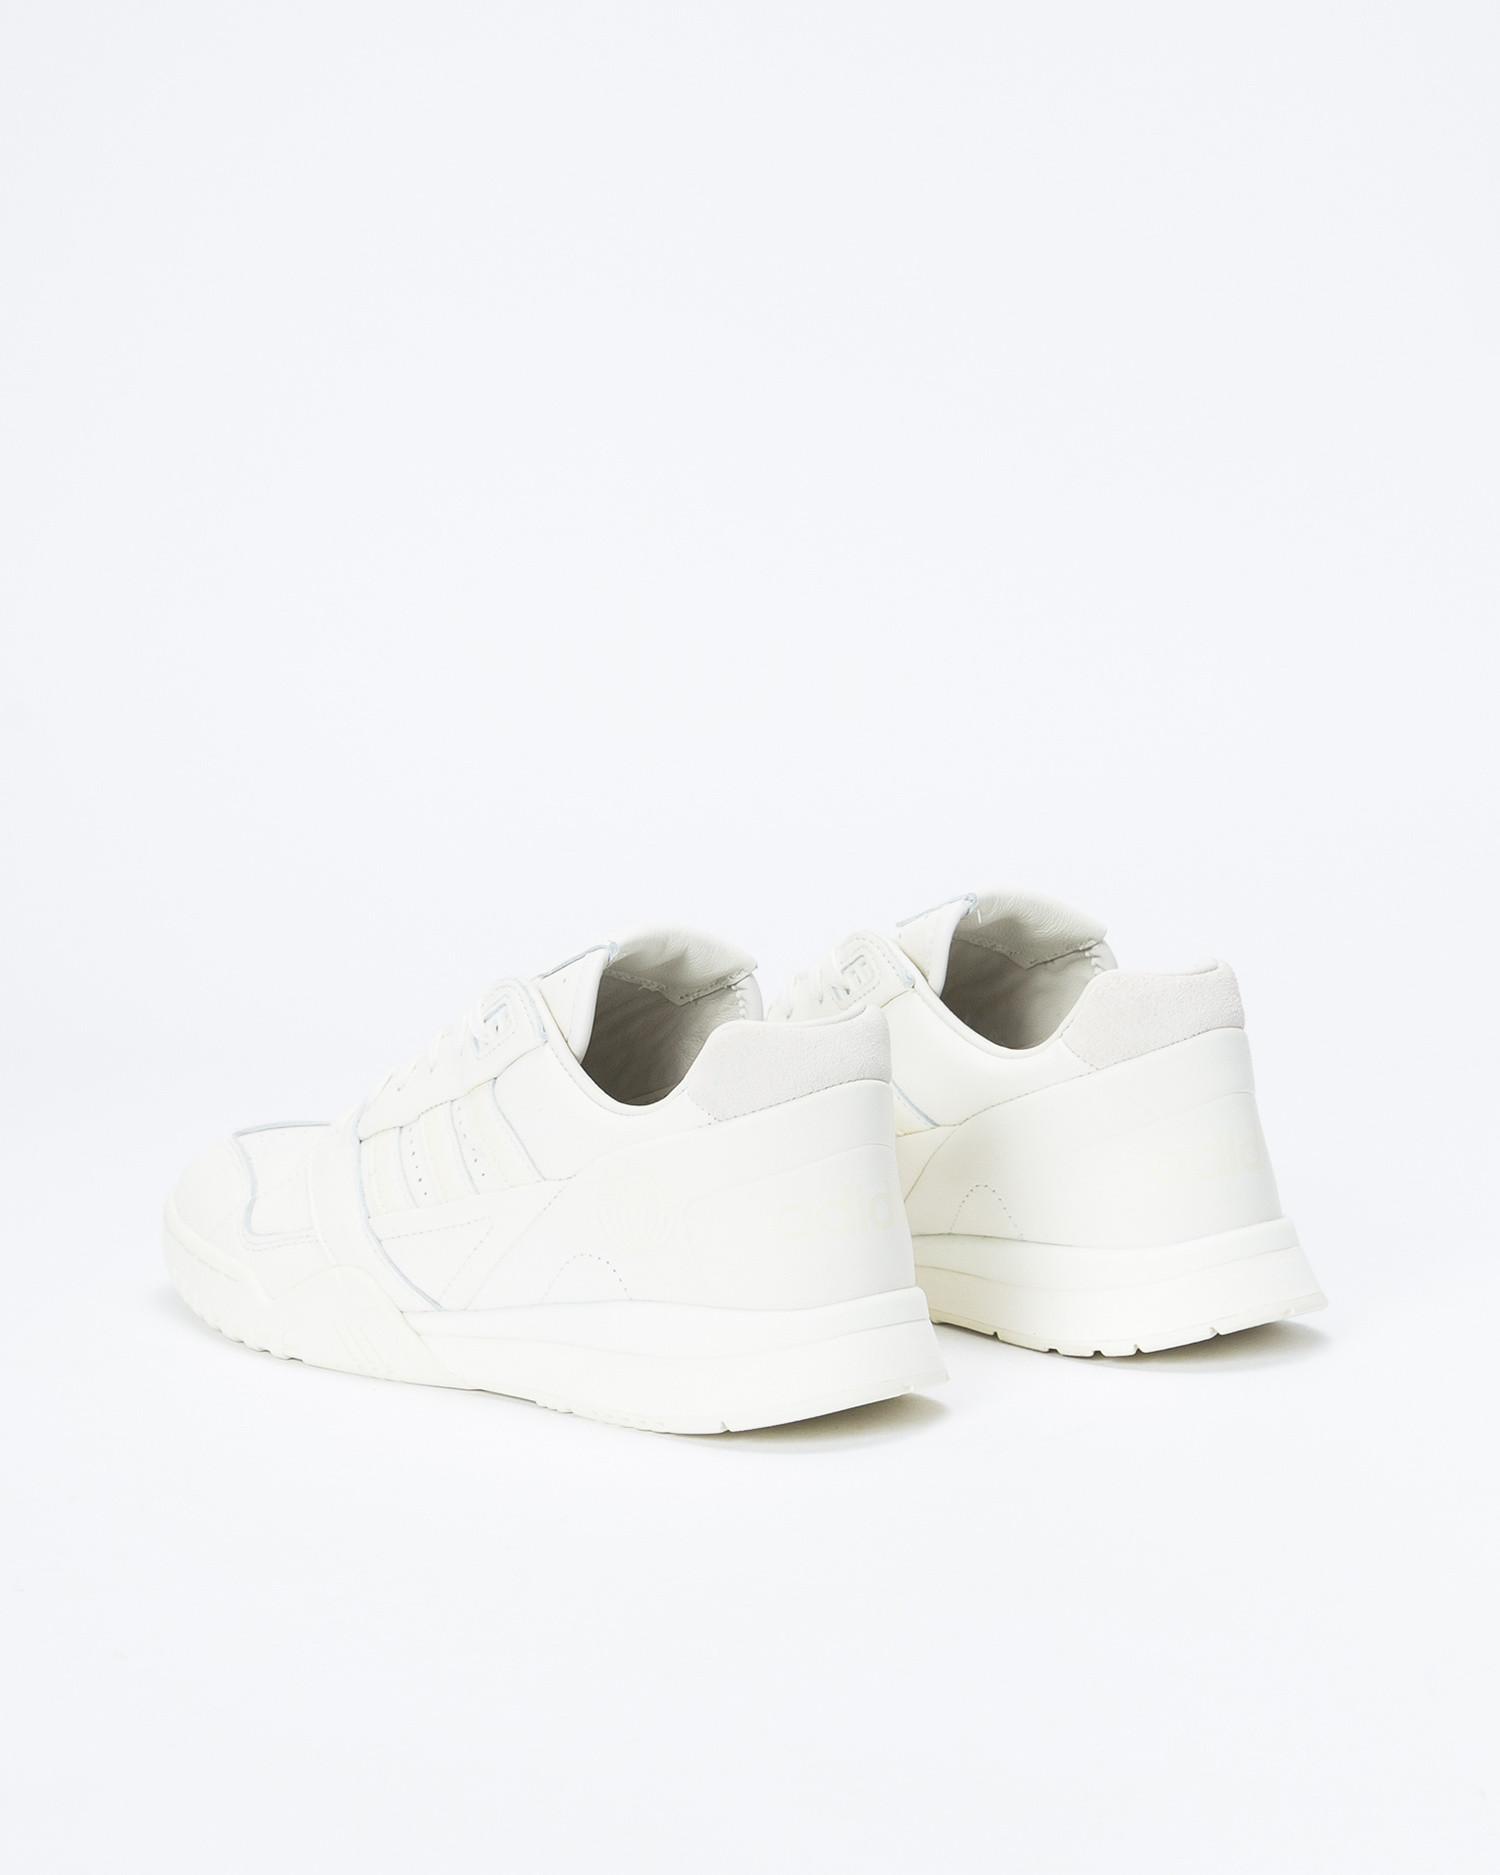 Adidas A.R. Trainer Offwhite/Offwhite/Offwhite